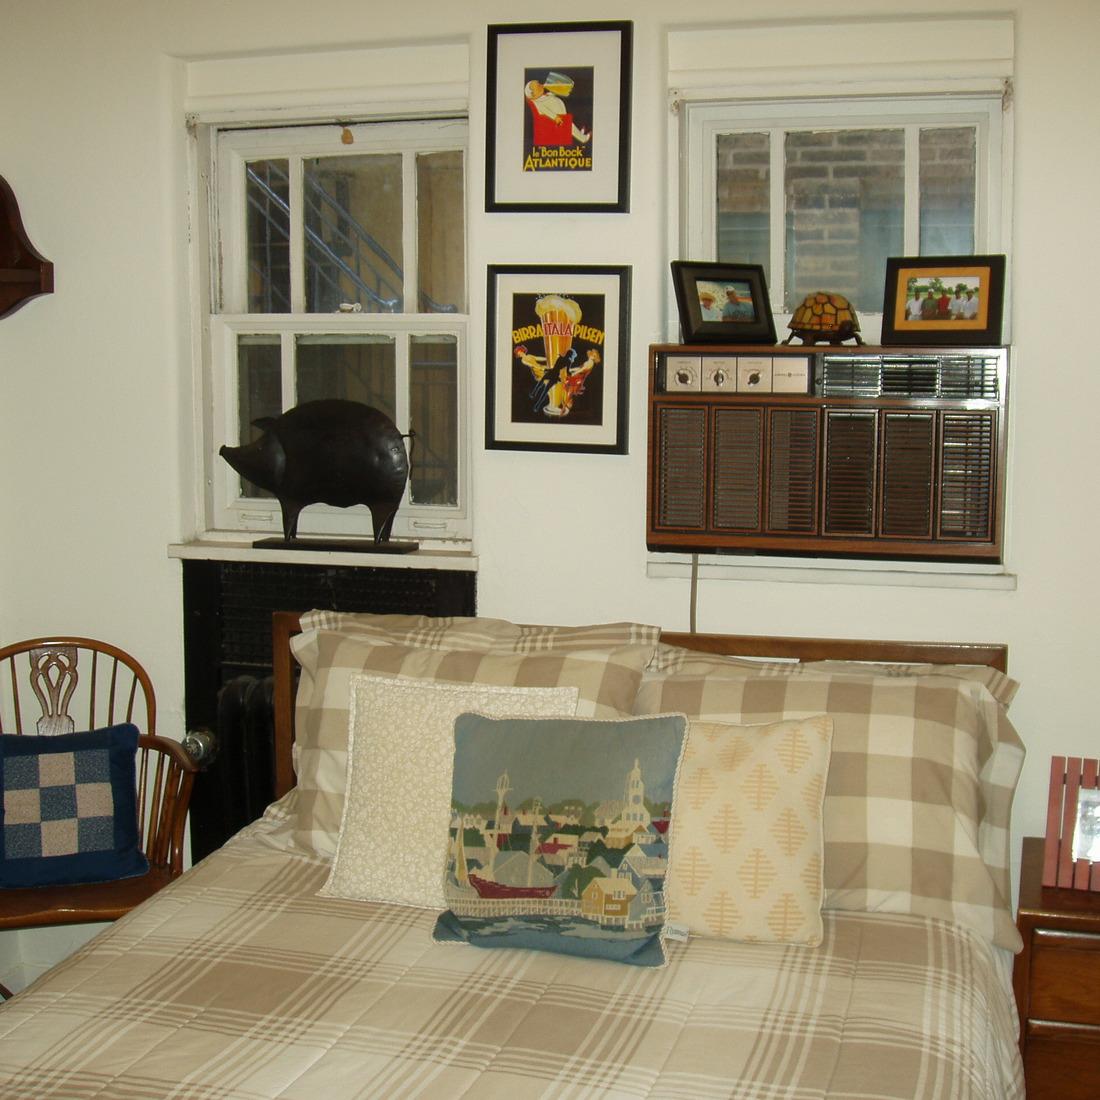 interior of 342 S. Highland Ave, Apt. 12A 10